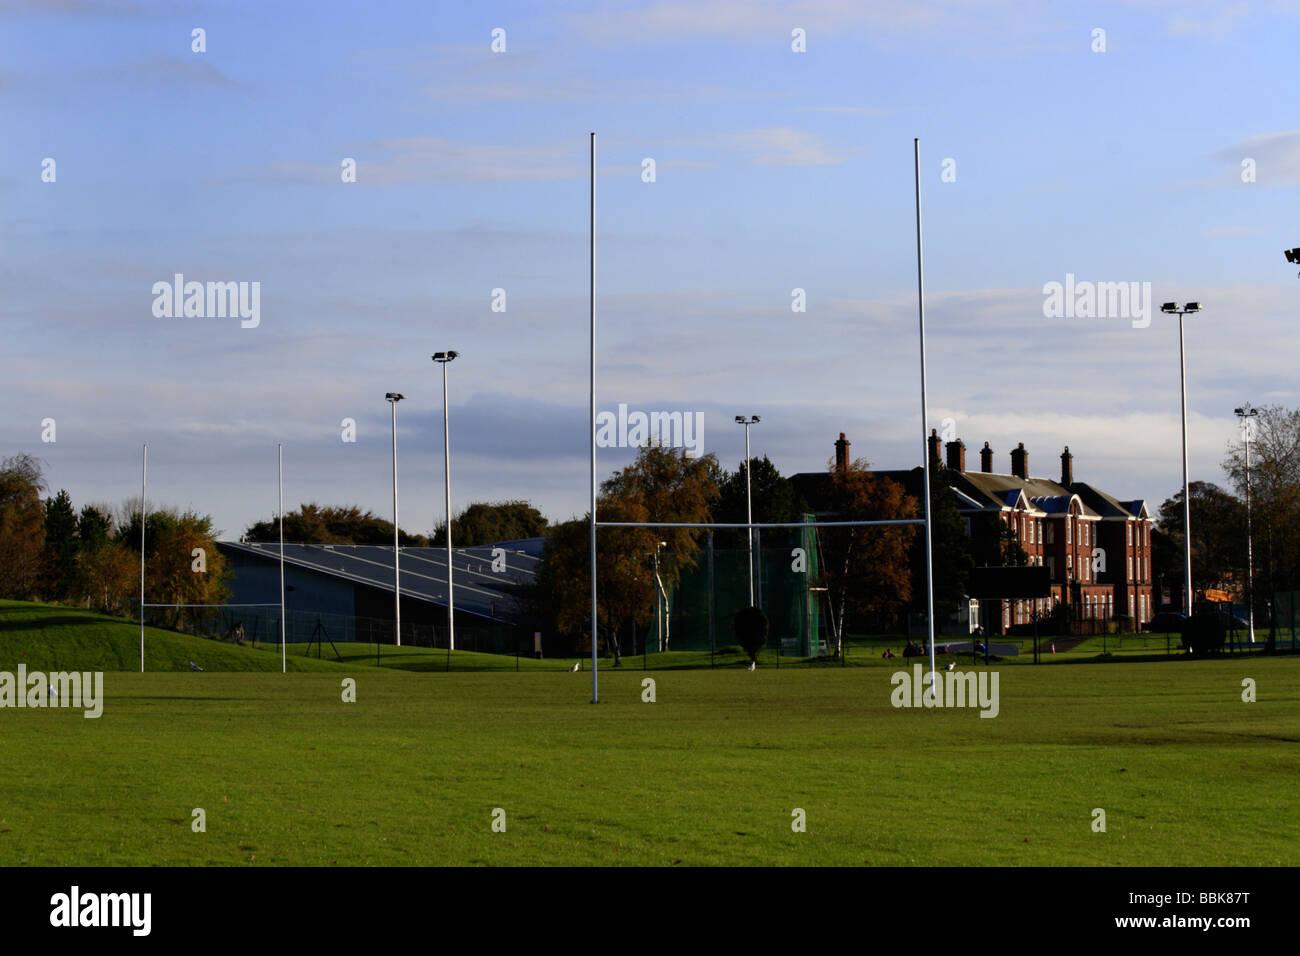 Carnegie College Leeds Stock Photo, Royalty Free Image: 24395164 ...